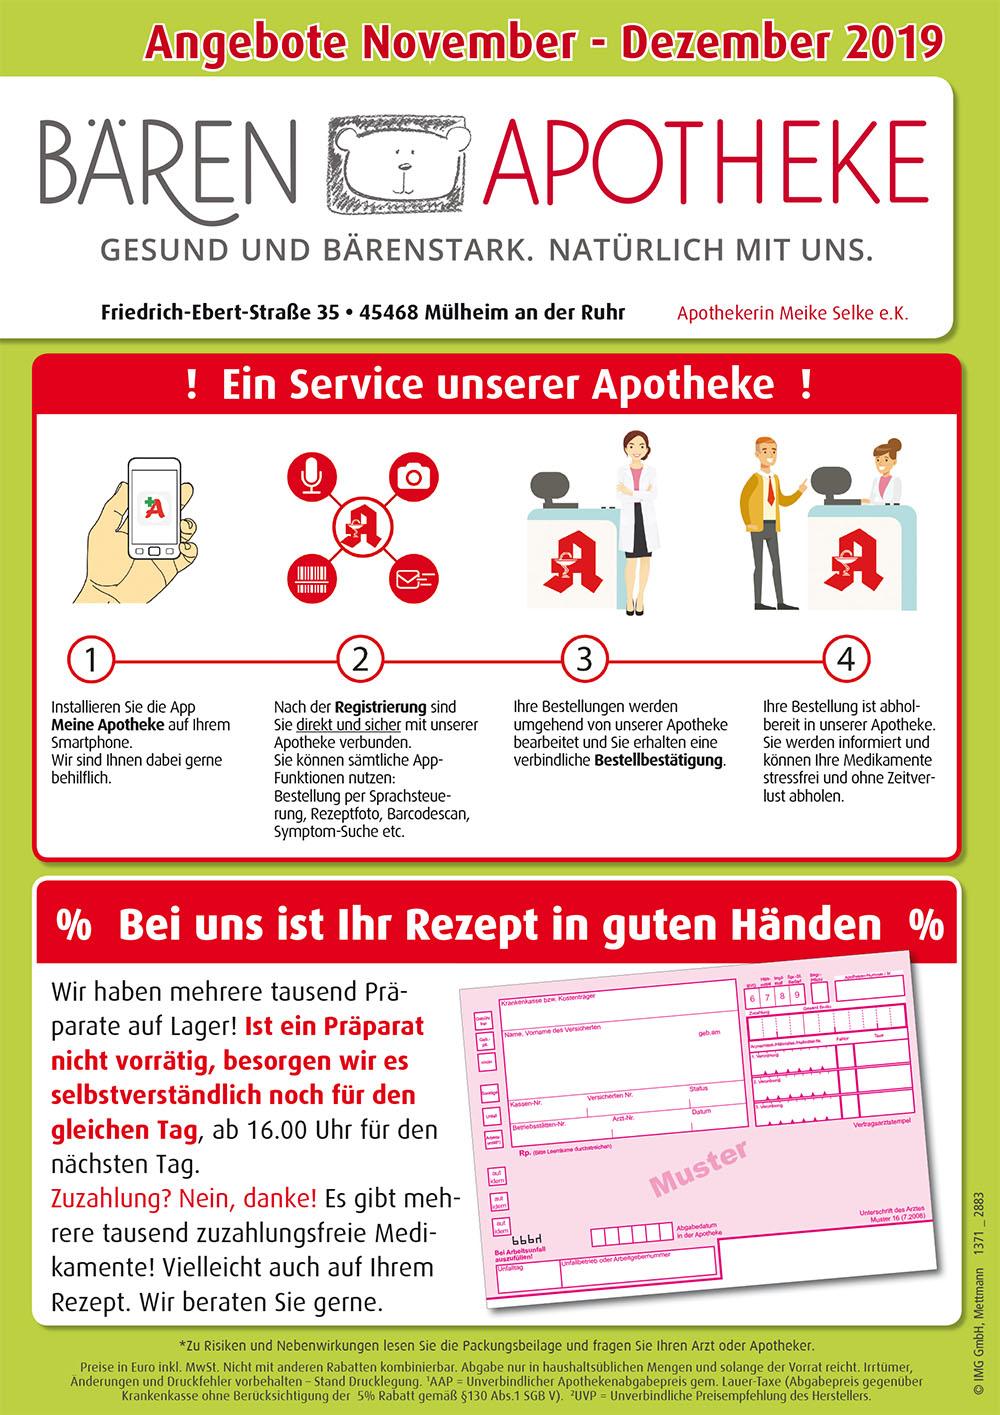 https://www-apotheken-de.apocdn.net/fileadmin/clubarea/00000-Angebote/45468_9082_baeren_angebot_1.jpg